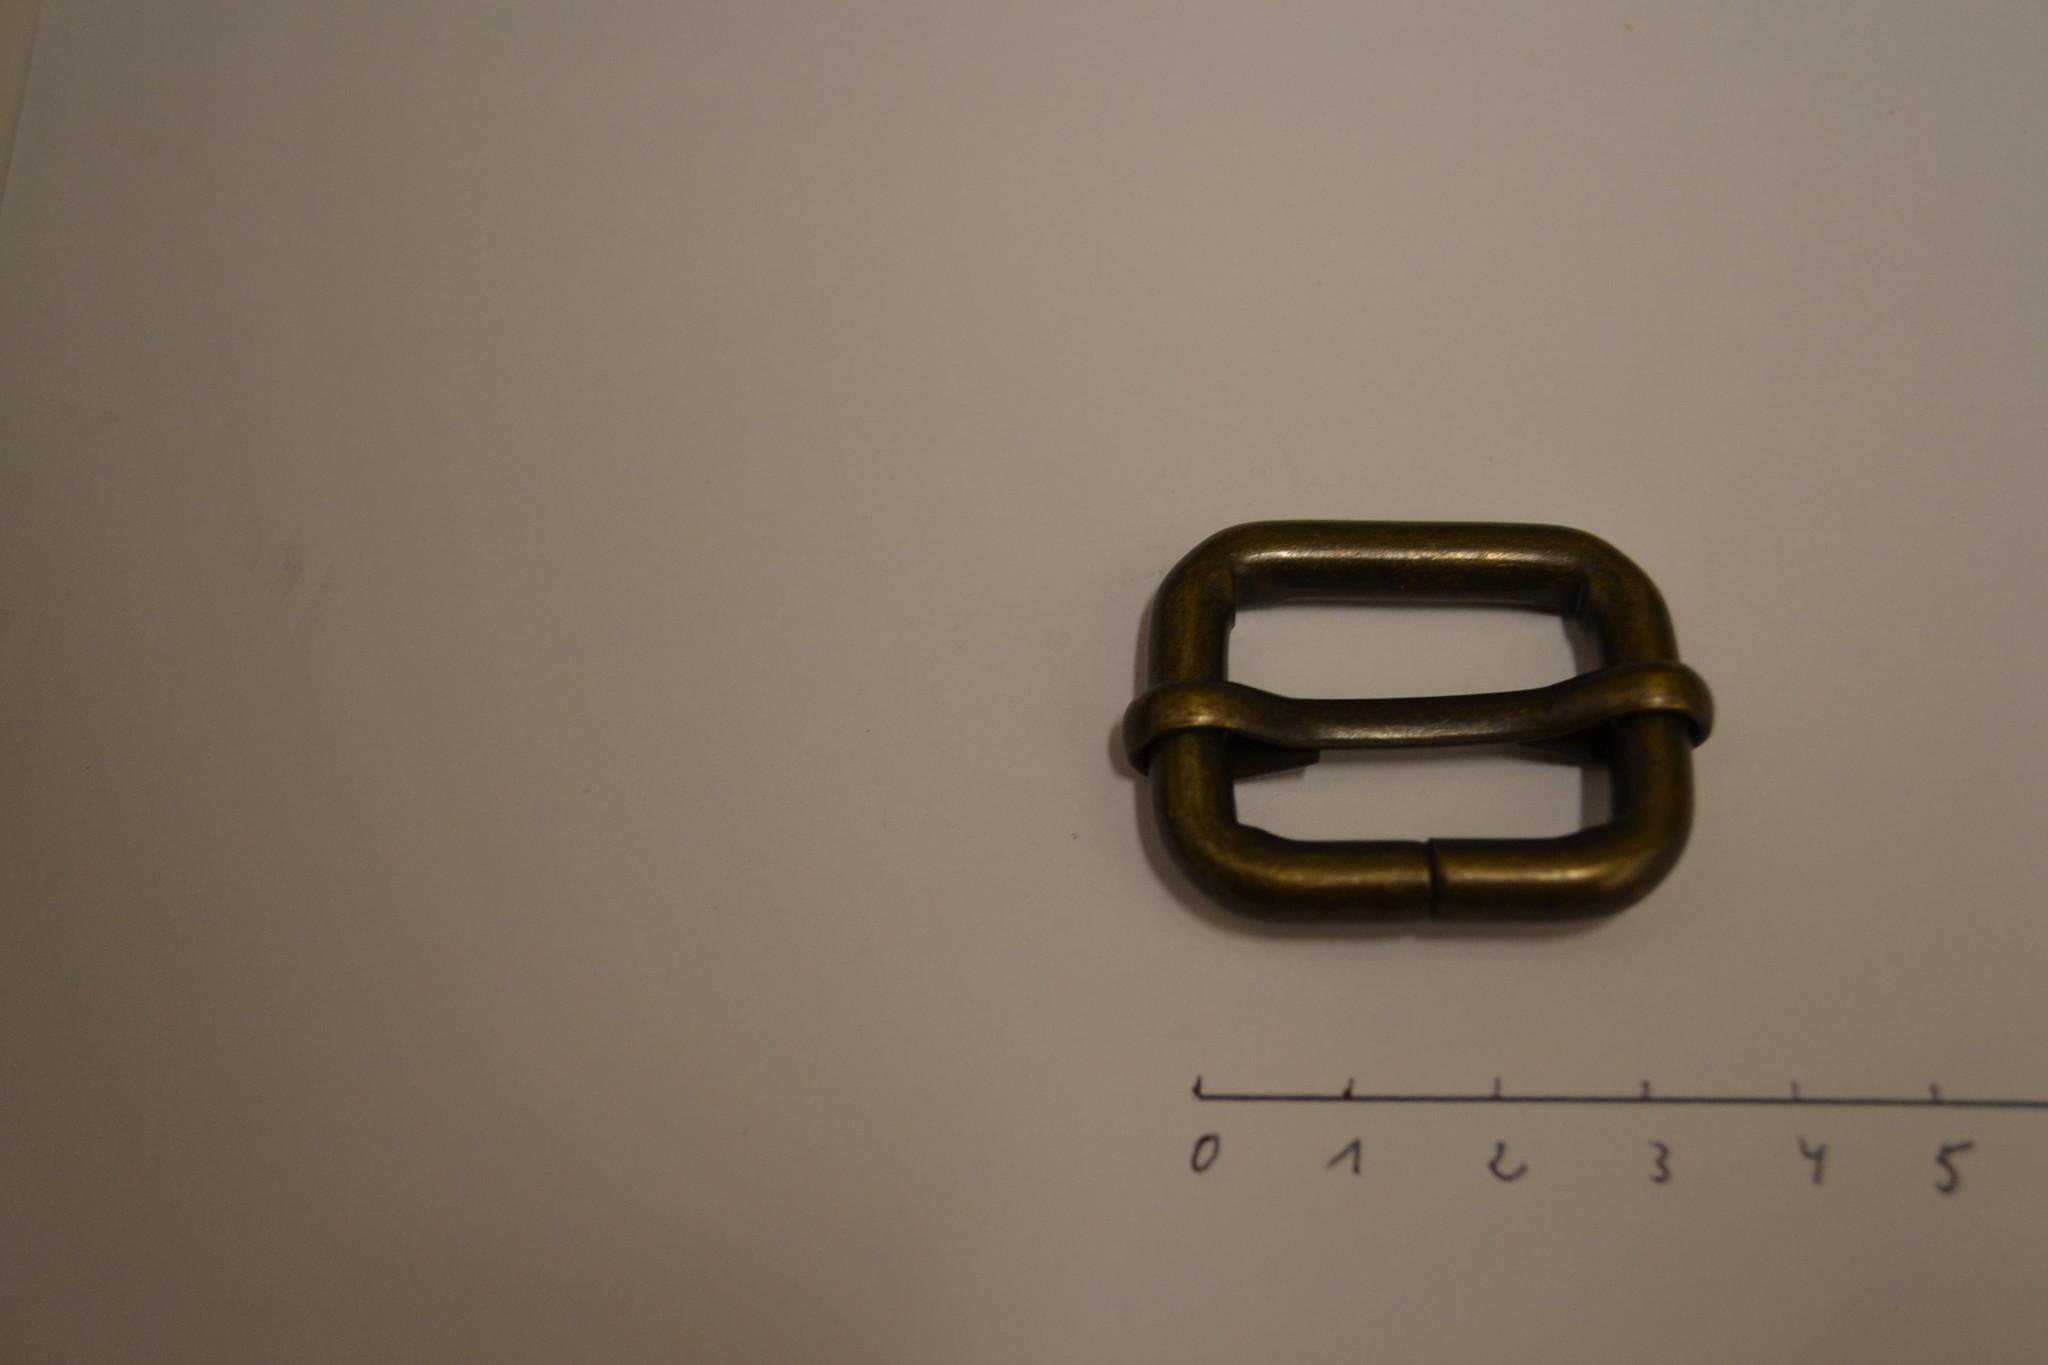 S30 Schuifgesp 25mm brons 25x20x6